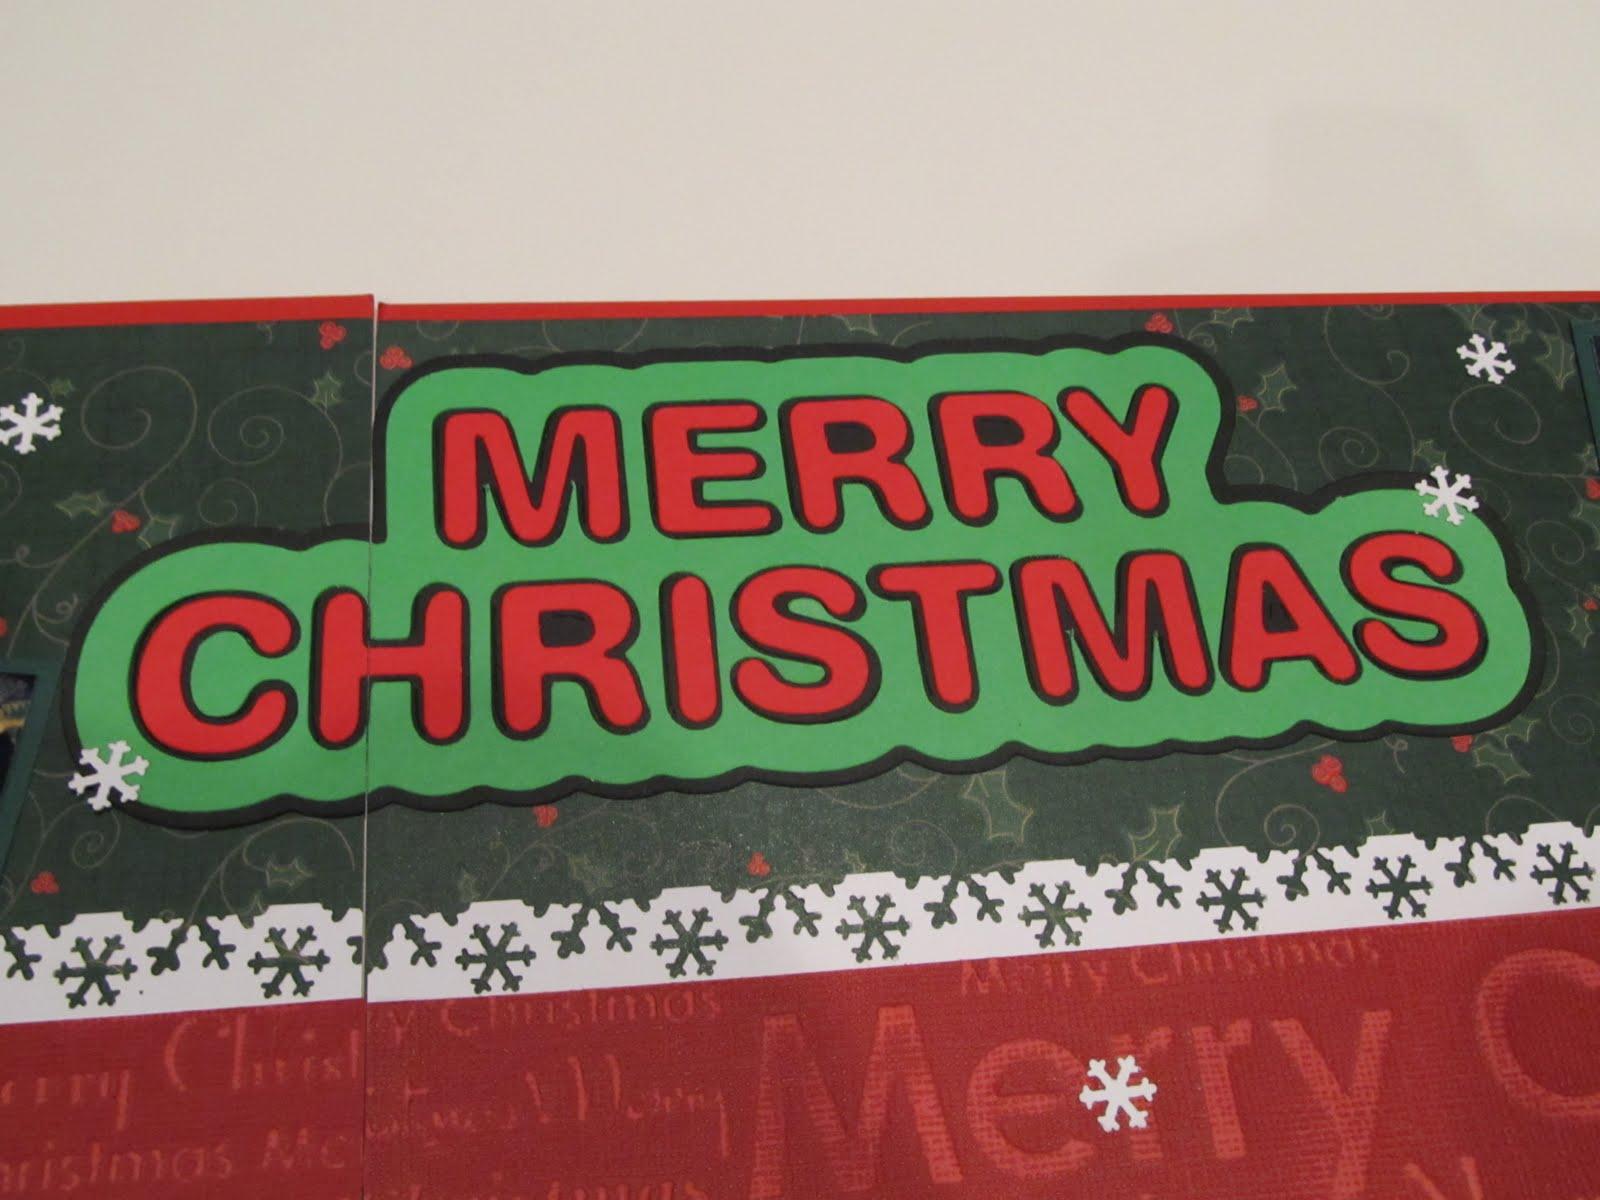 Creative cricut designs more hello kitty merry christmas hello kitty greetings cricut cartridge hello kitty 3 14 tree 6 title 2 34 m4hsunfo